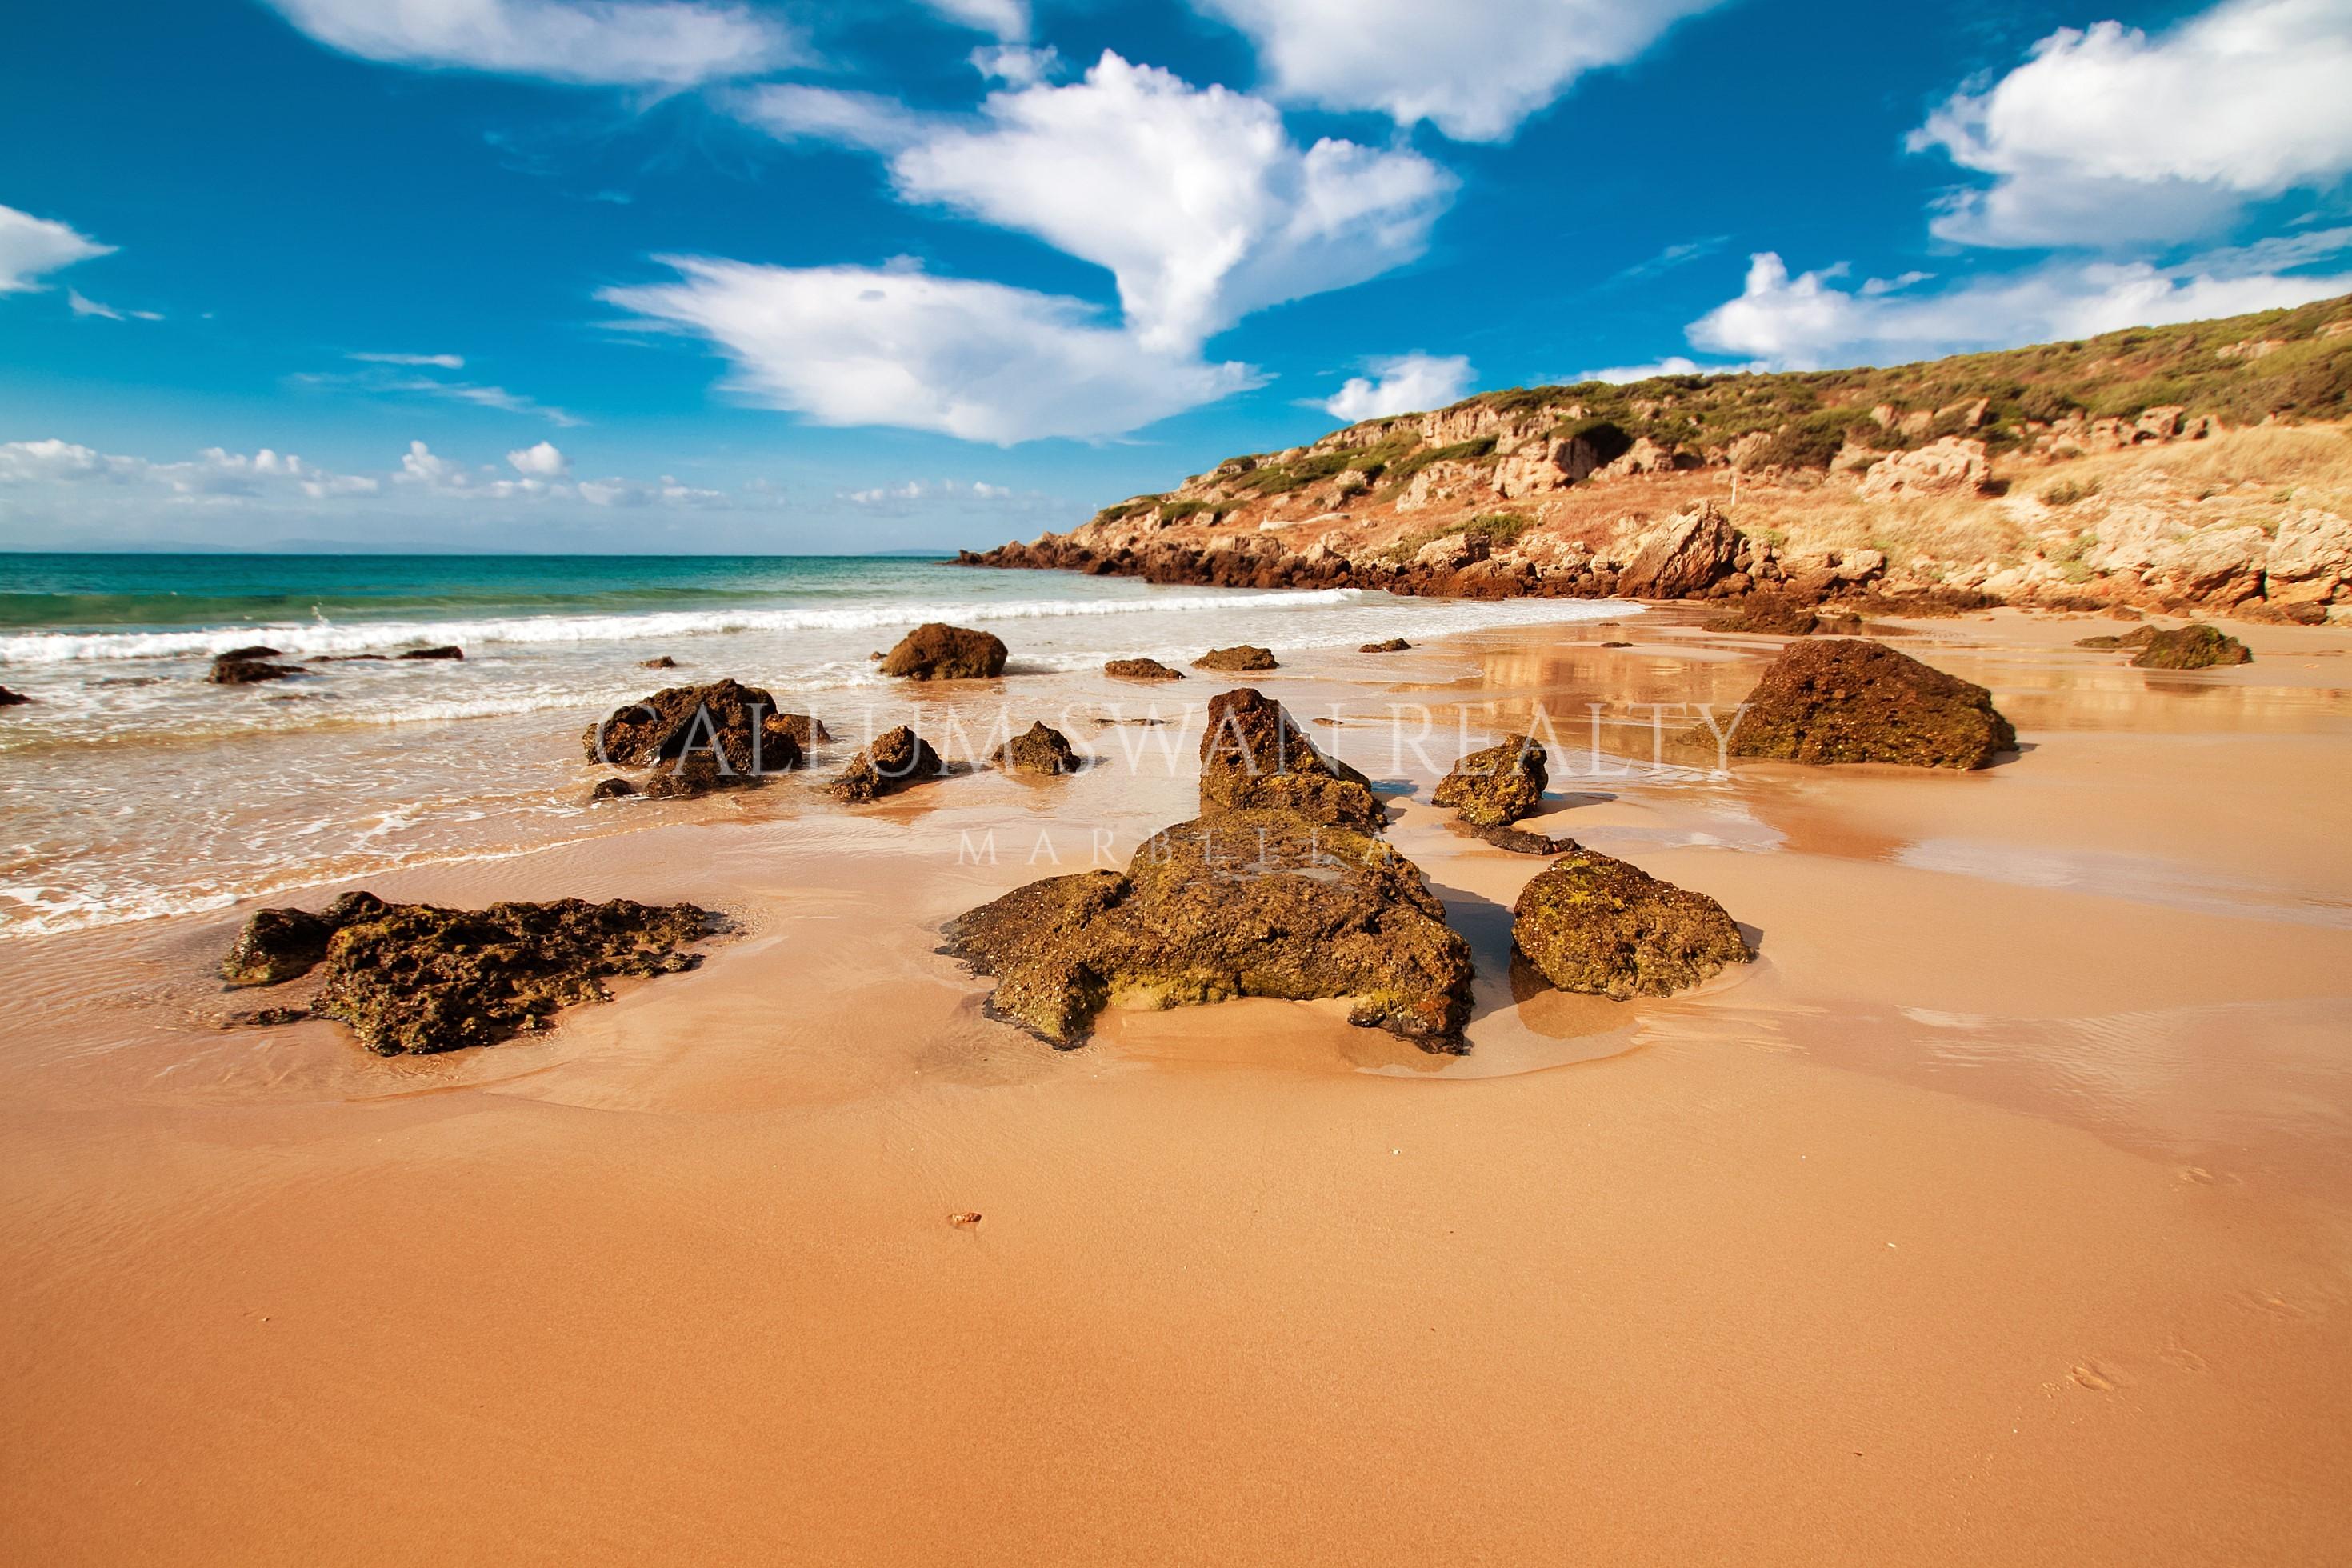 Tarifa - Where Spain and Morocco combine